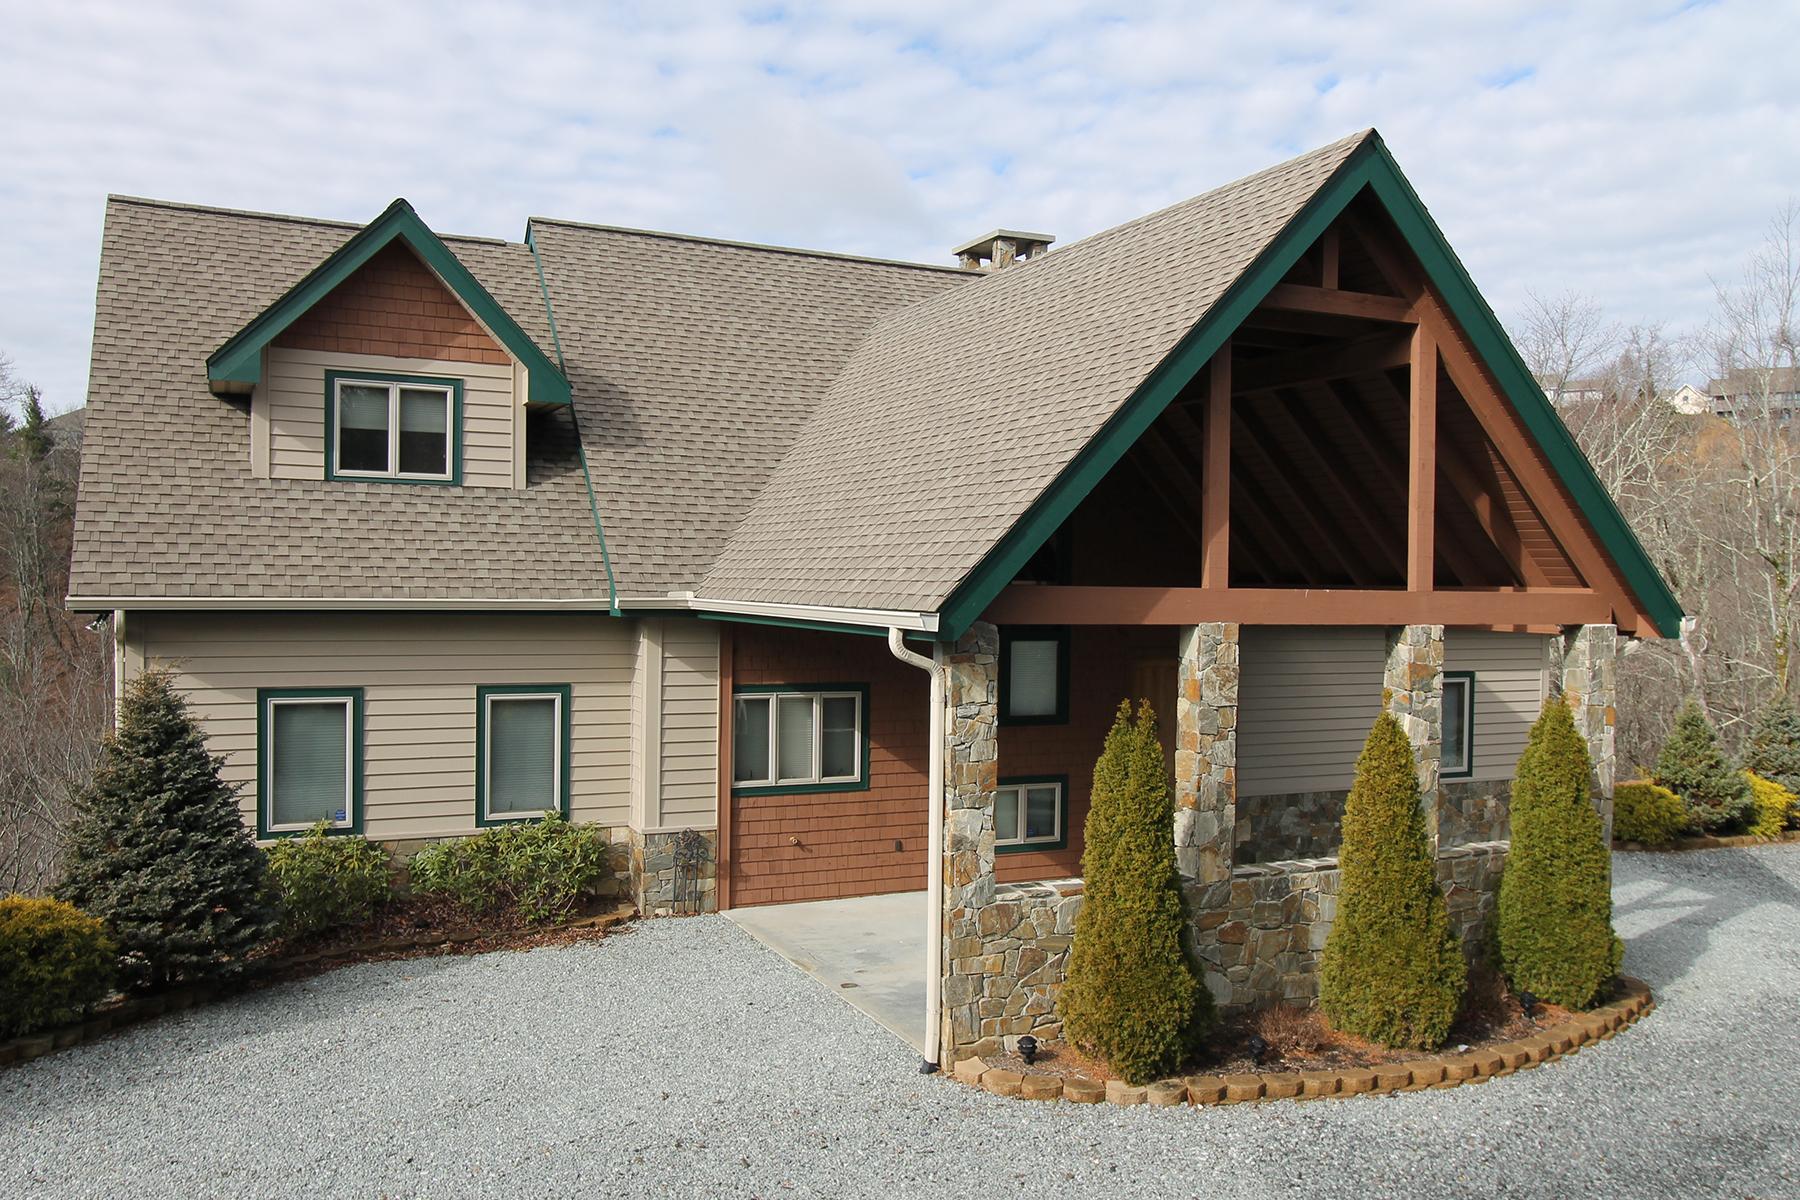 Single Family Home for Sale at BOONE - GREYSTONE IV 442 Boone Coffey Trail, Boone, North Carolina 28605 United States